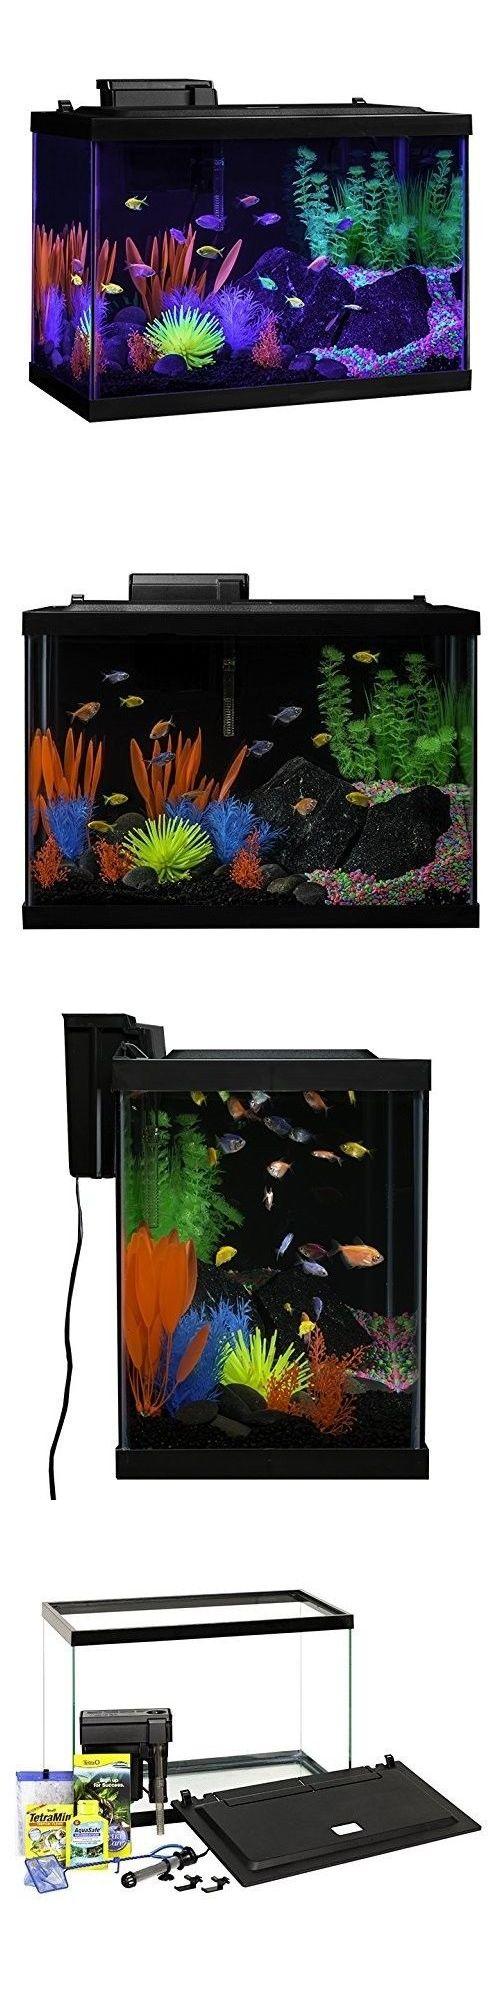 17 best ideas about 20 gallon aquarium on pinterest for Best fish tank heater